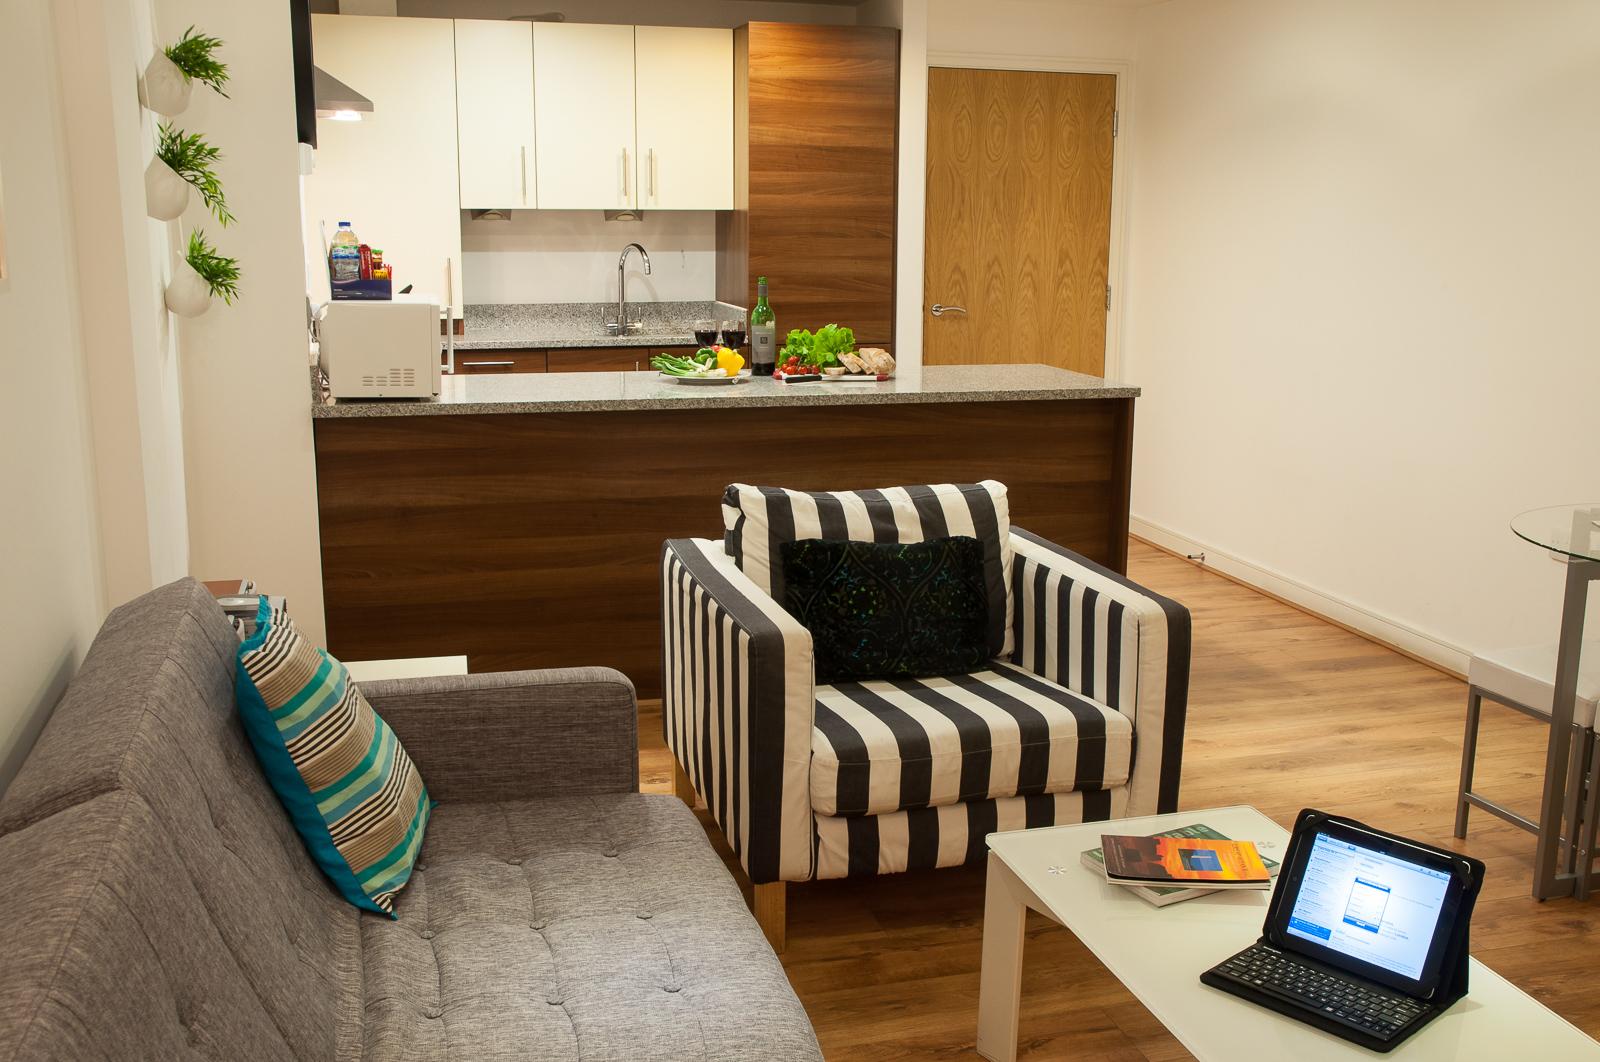 Steward Street - living space